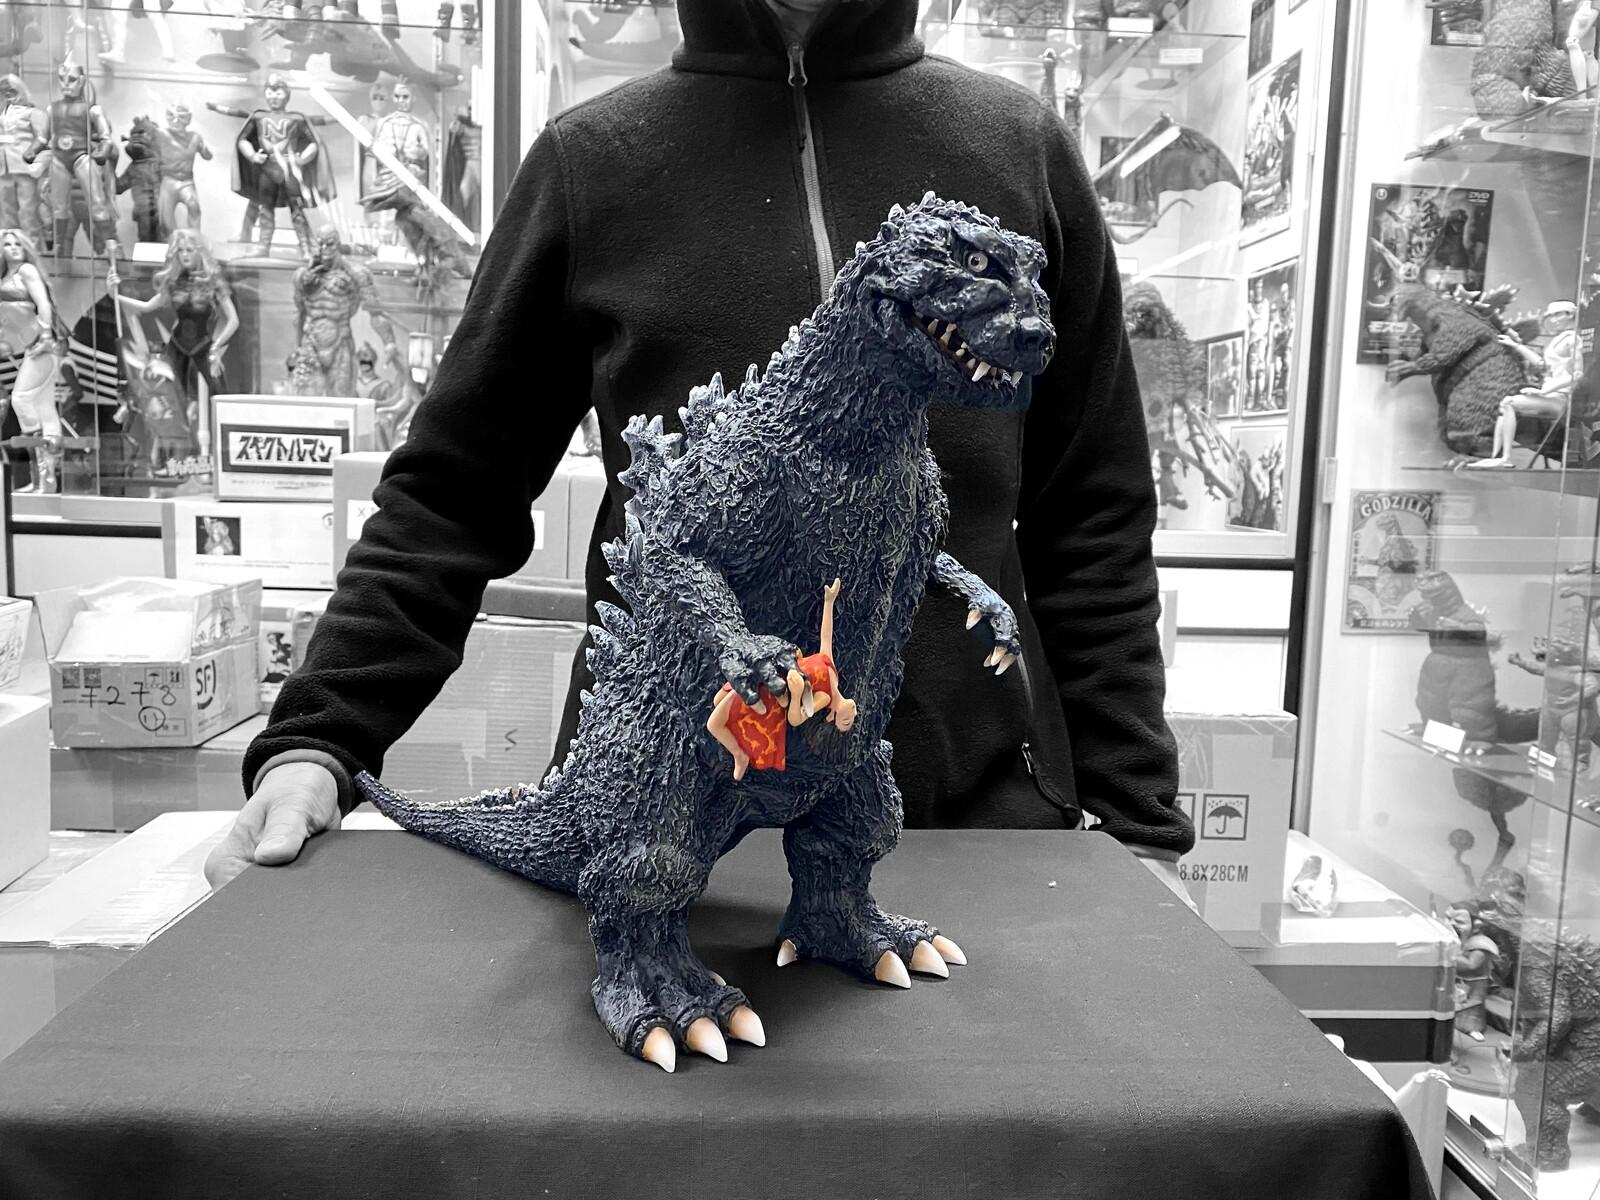 54 Godzilla pamphlet poster version Art Statue  ゴジラ パンフレット ポスター版  完成品 https://www.solidart.club